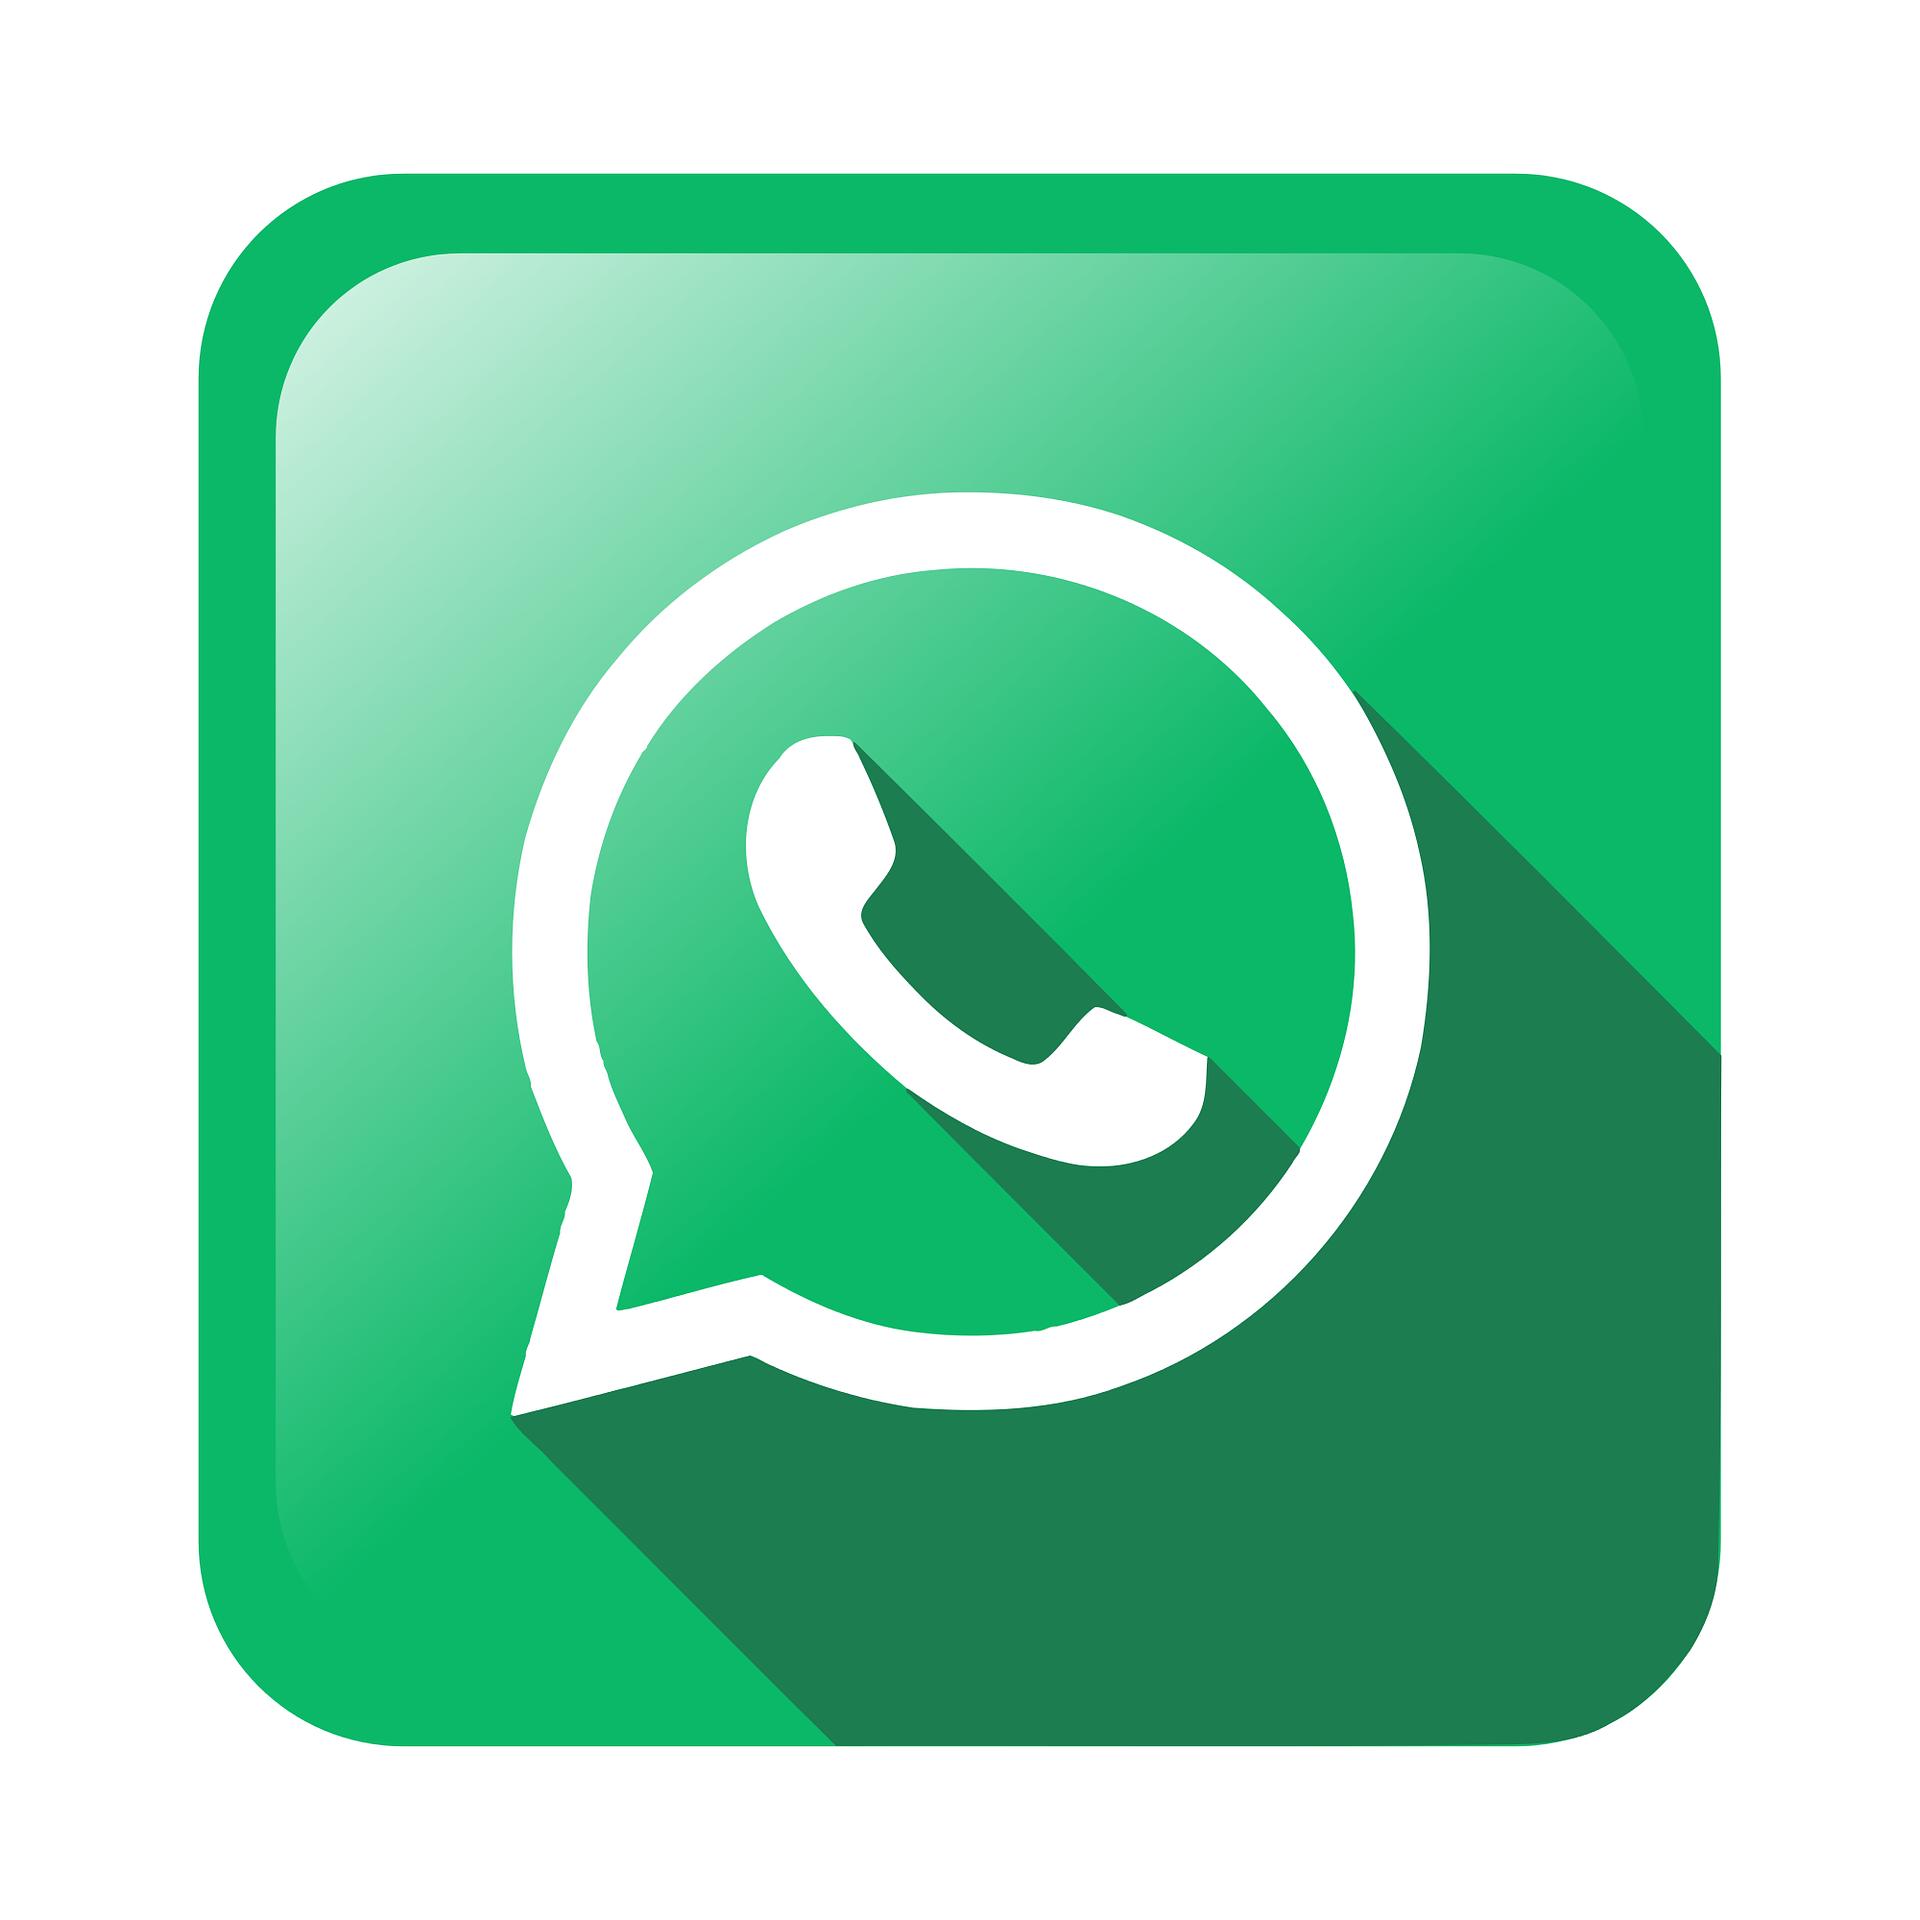 whatsapp gb pro 2021 | Receita de brigadeiro gourmet, Brigadeiro para  vender, Bar de brigadeiro